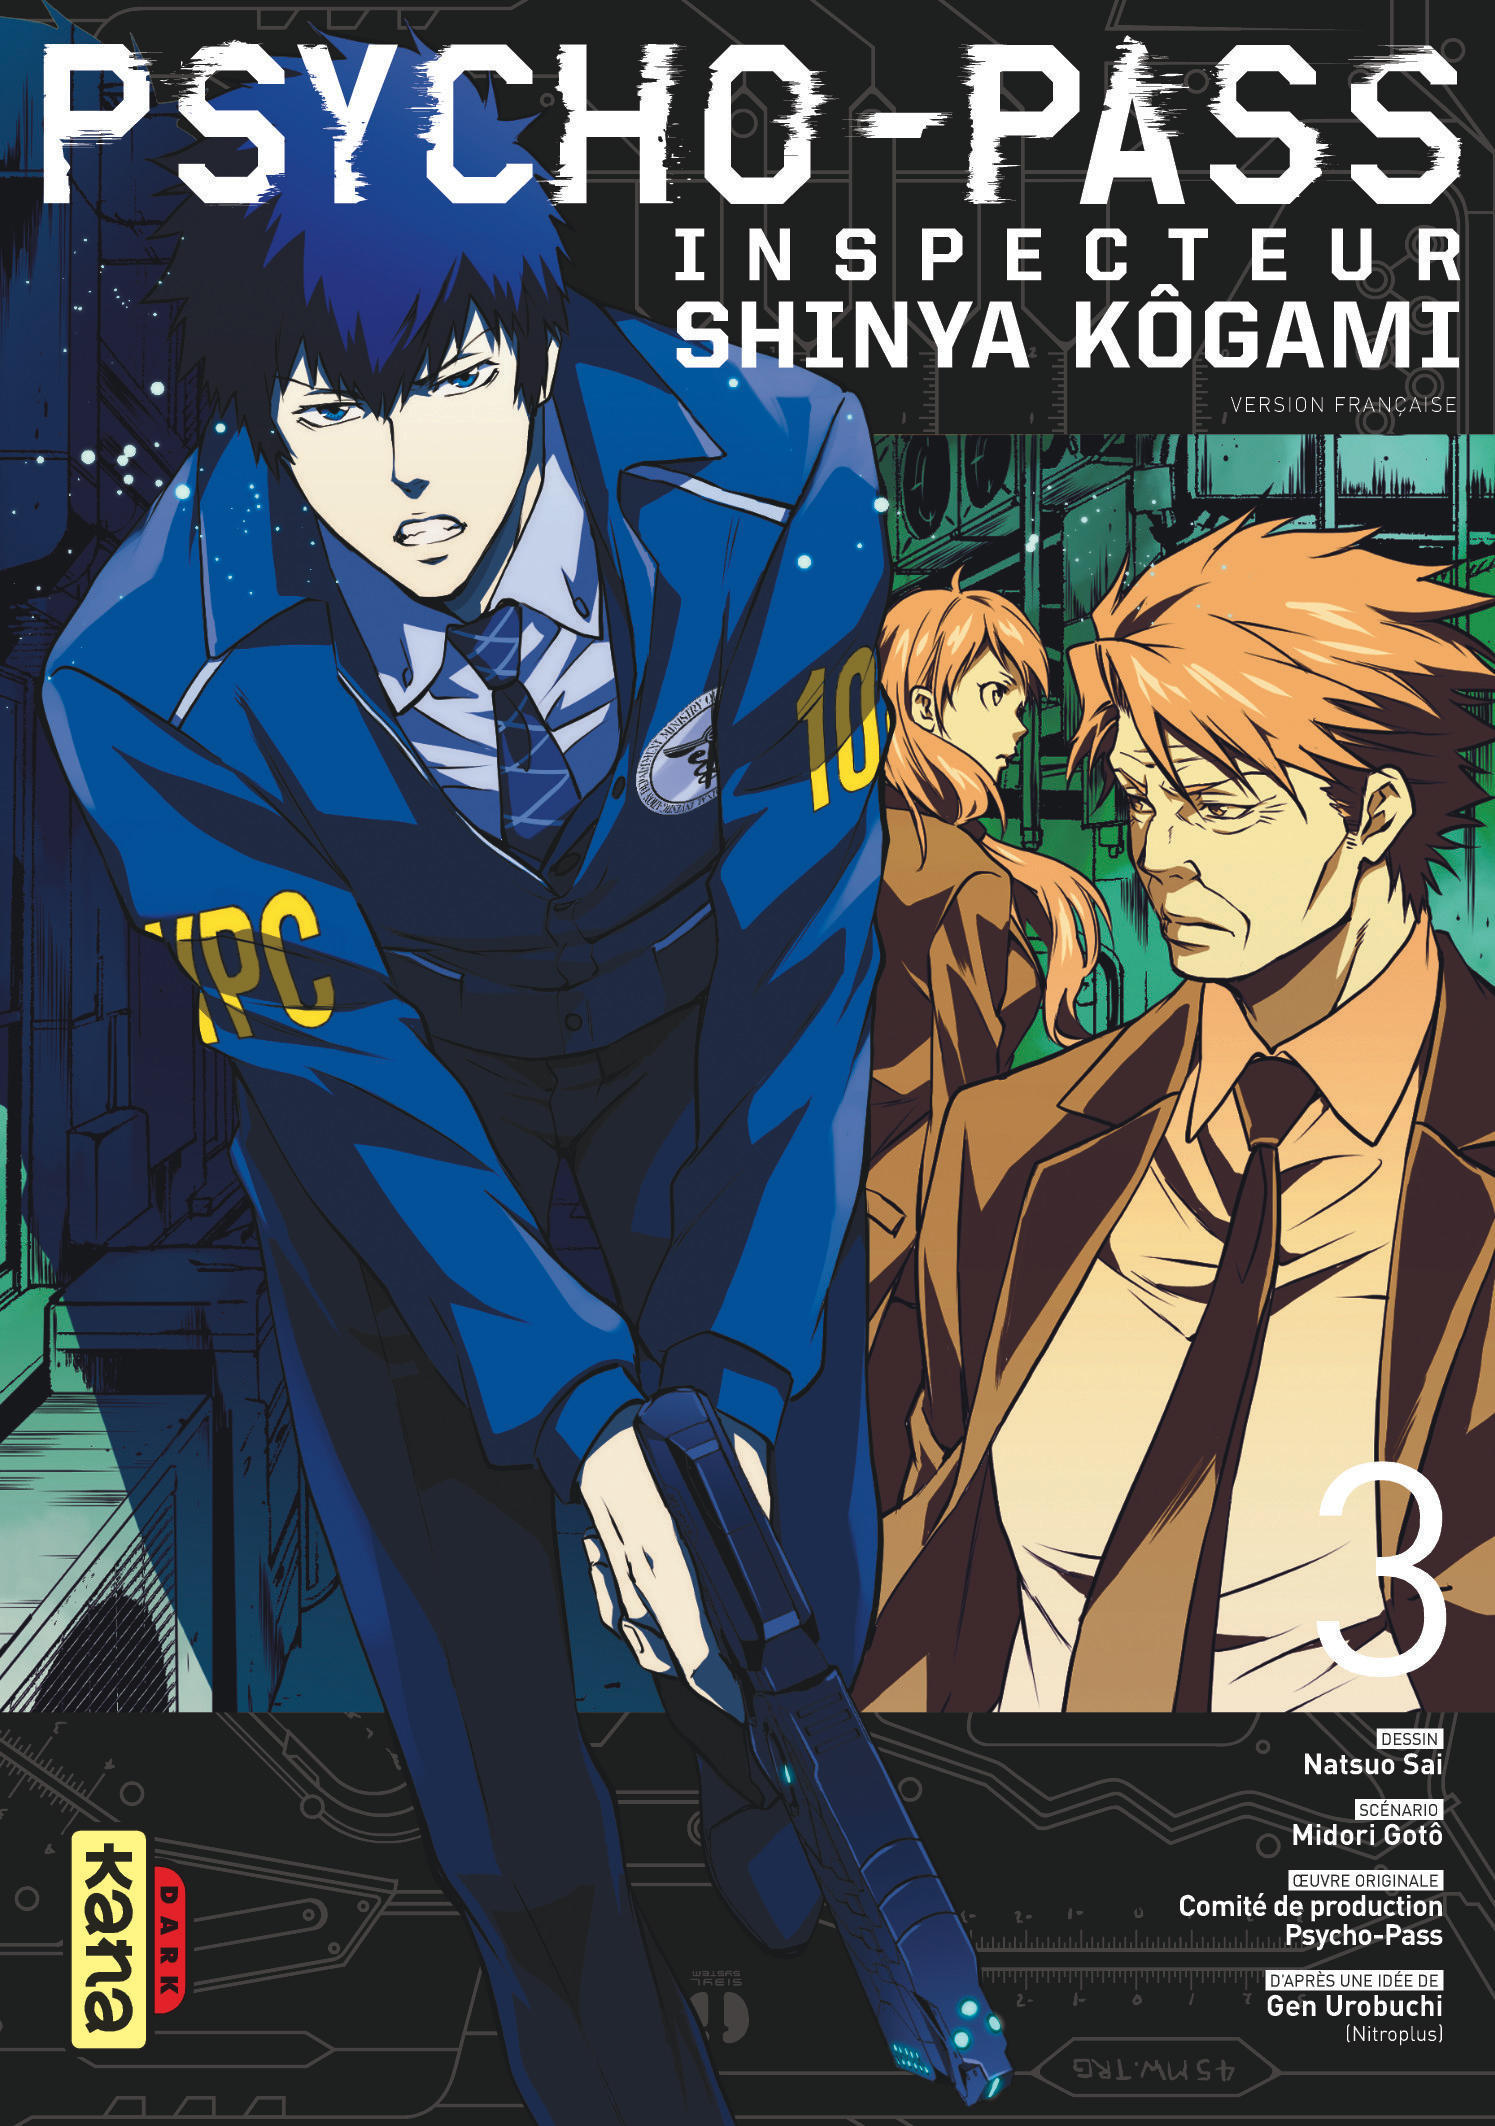 PSYCHO-PASS INSPECTEUR SHINYA KOGAMI - PROLOGUE T3